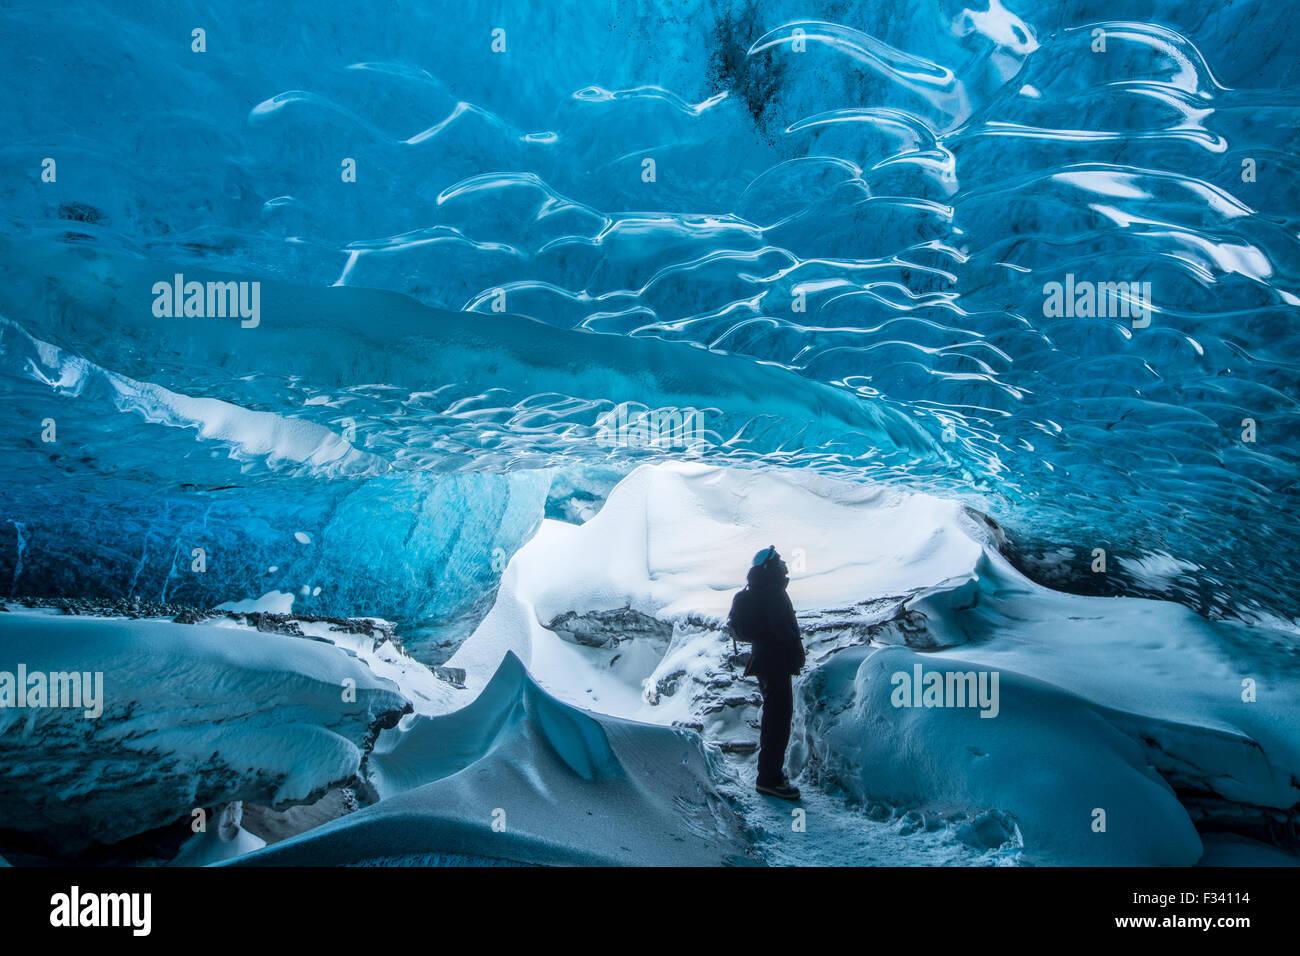 Ao Thor in an ice cave below the Breidamerkurjokull Glacier, eastern Iceland - Stock Image